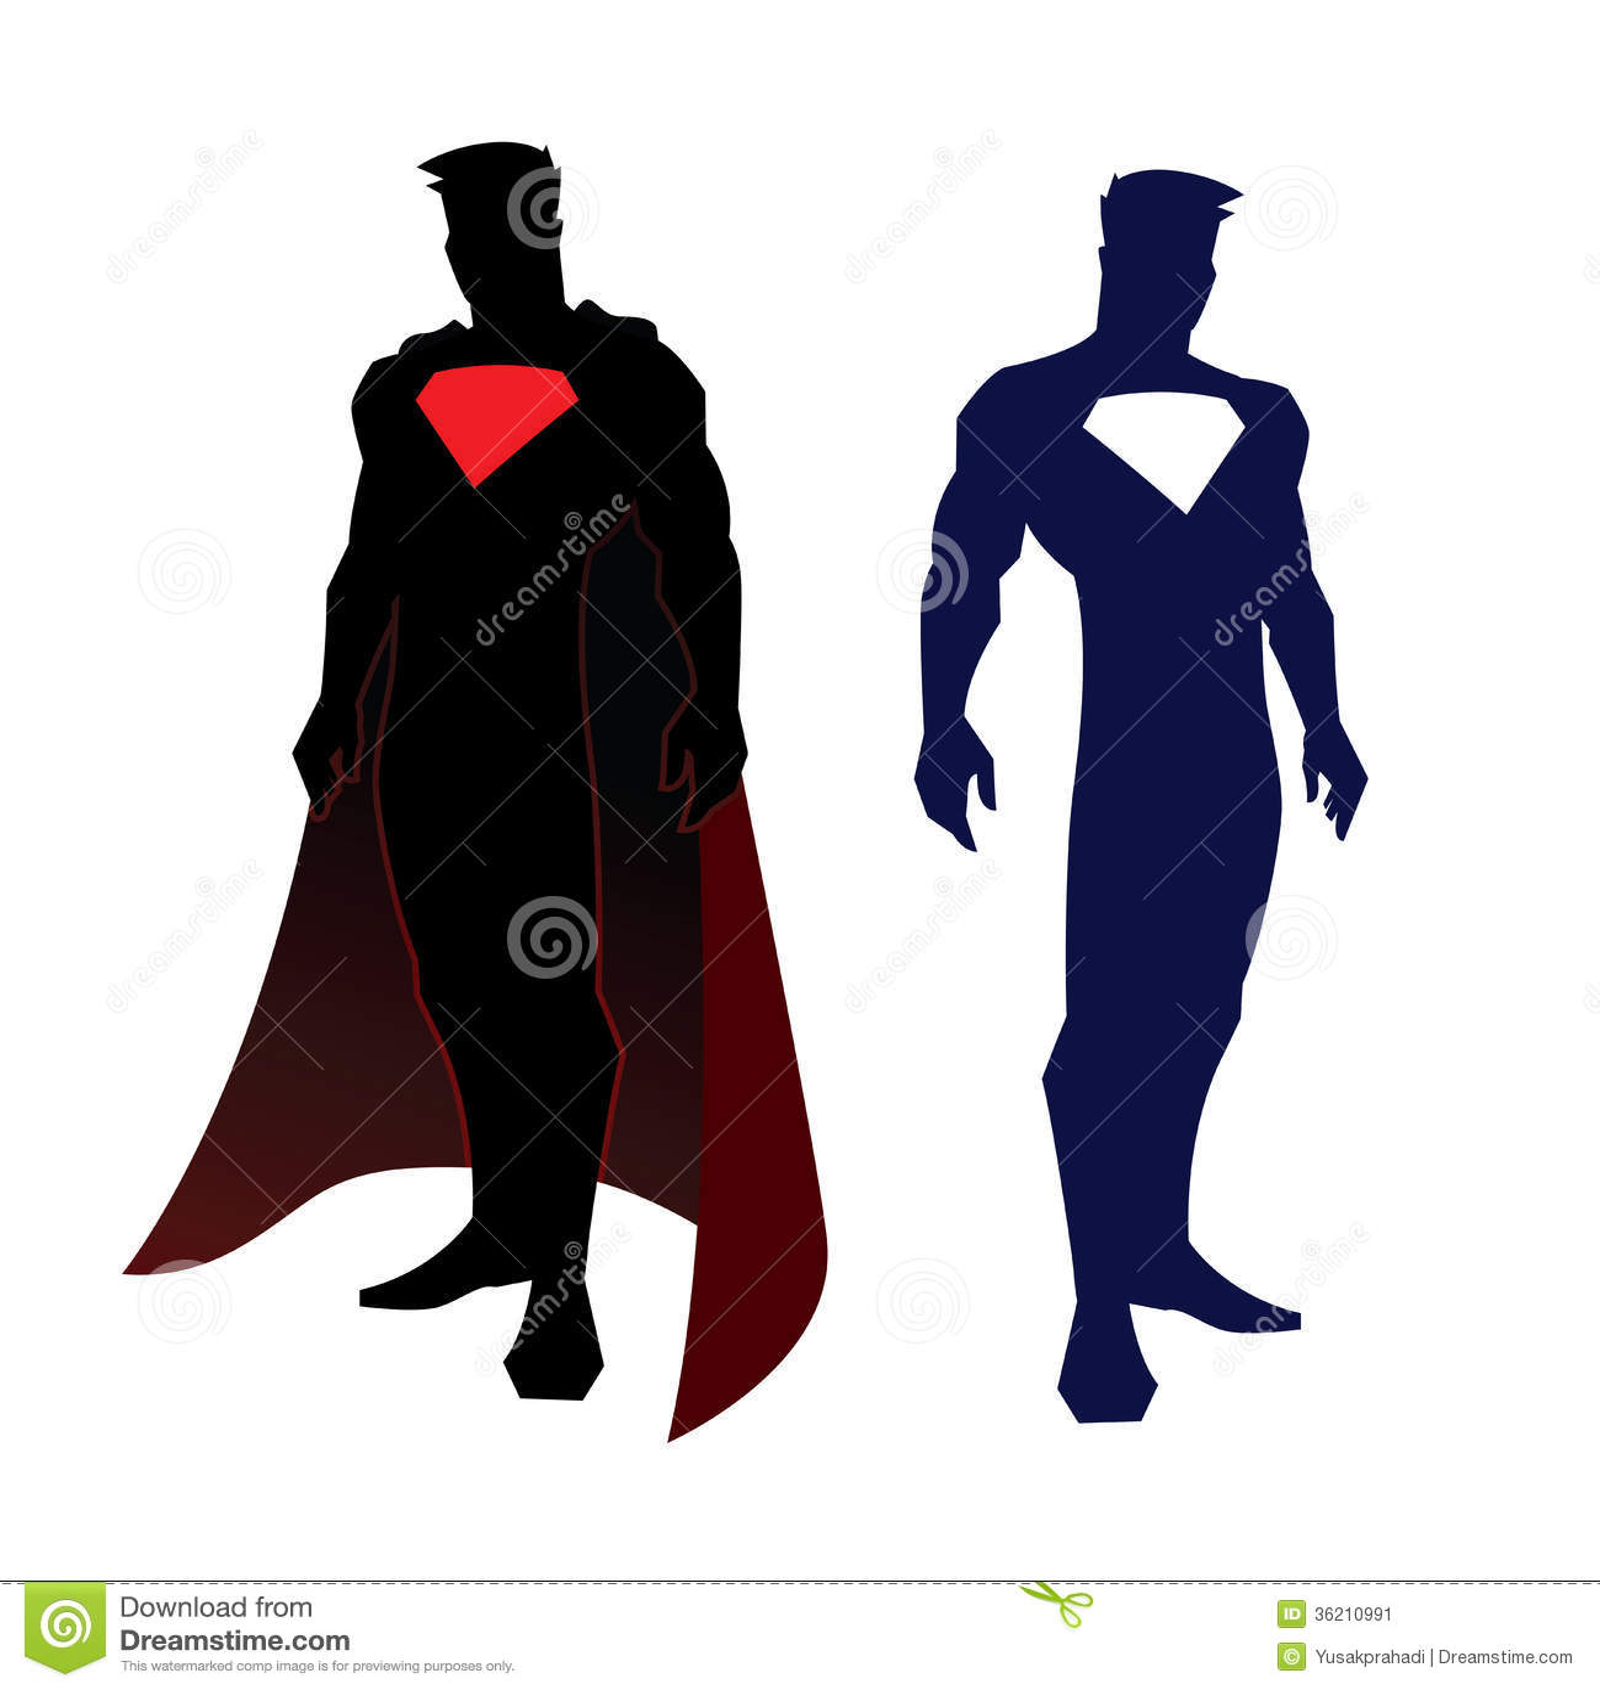 Superhero Silhouette Superhero figure stock image